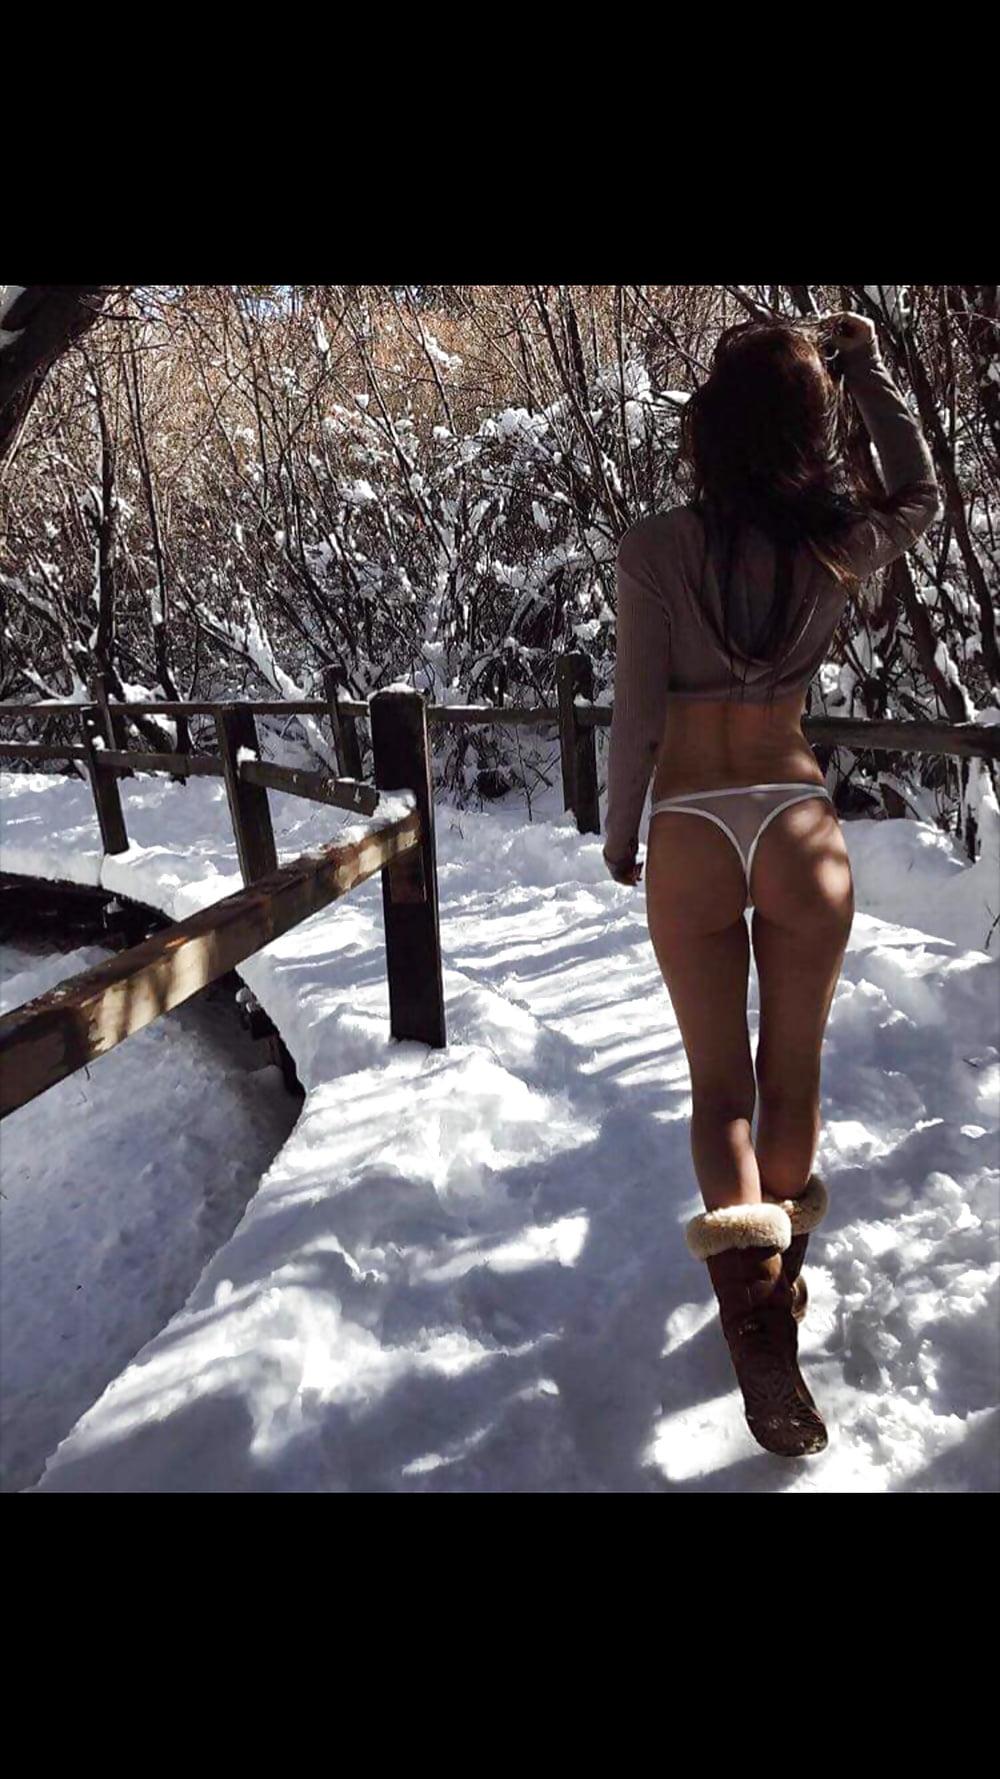 Hee haw girls nude